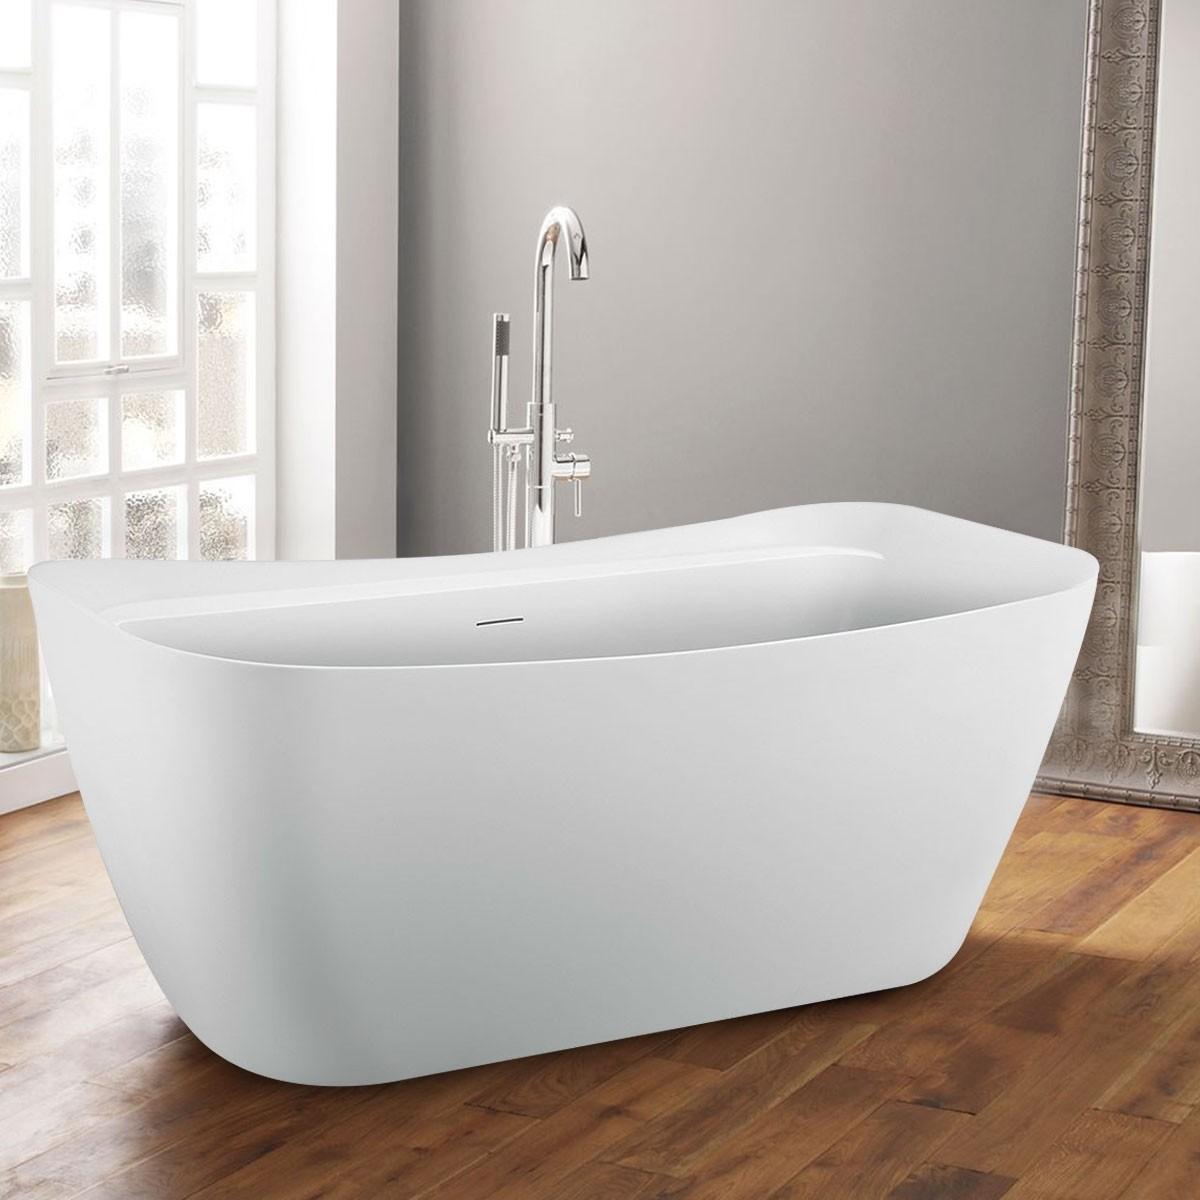 BATHPRO 59 In High-end Freestanding Bathtub - Acrylic Matte White (DK-MF-97578)